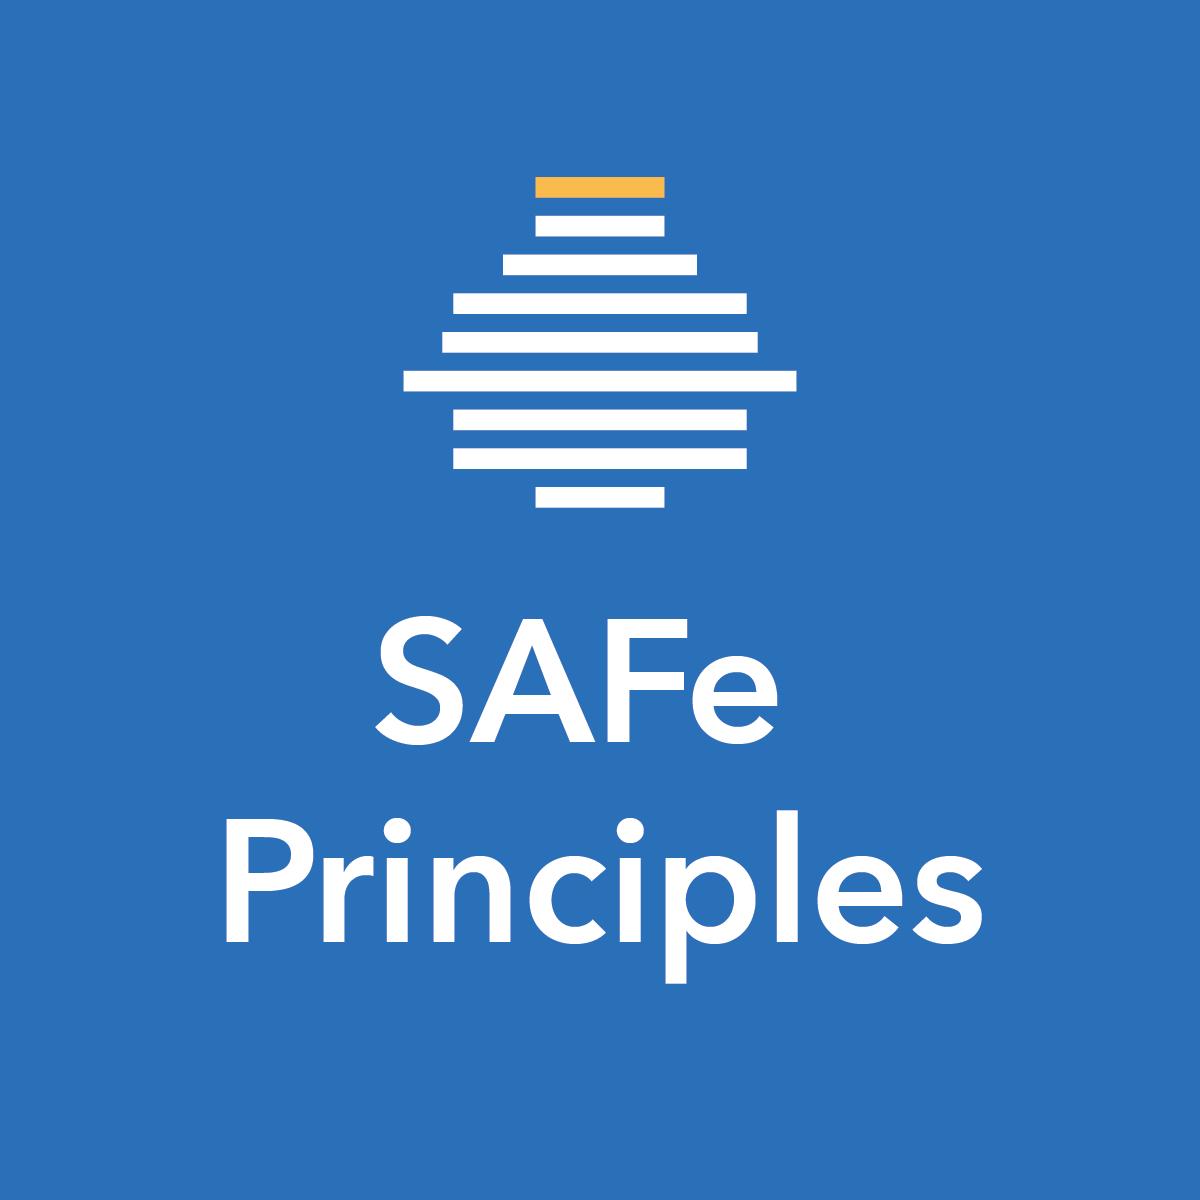 SAFe Principles